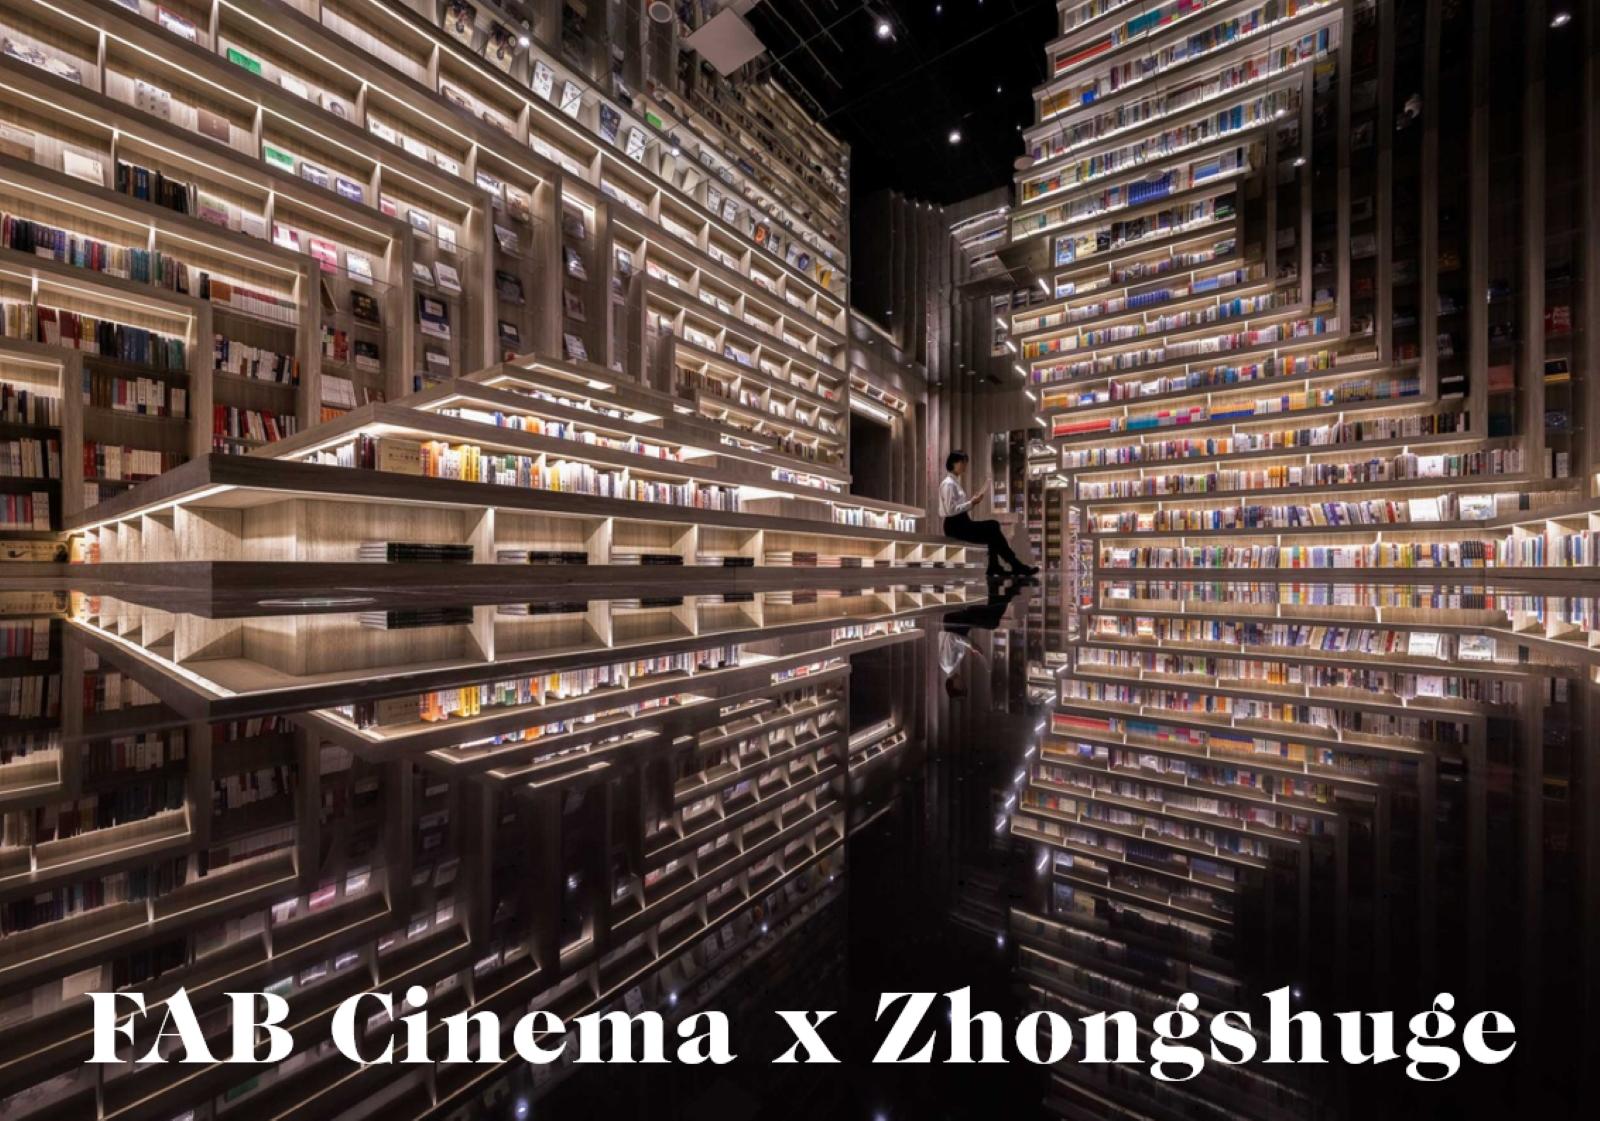 Fab cinema innovation tour missions mmm 0